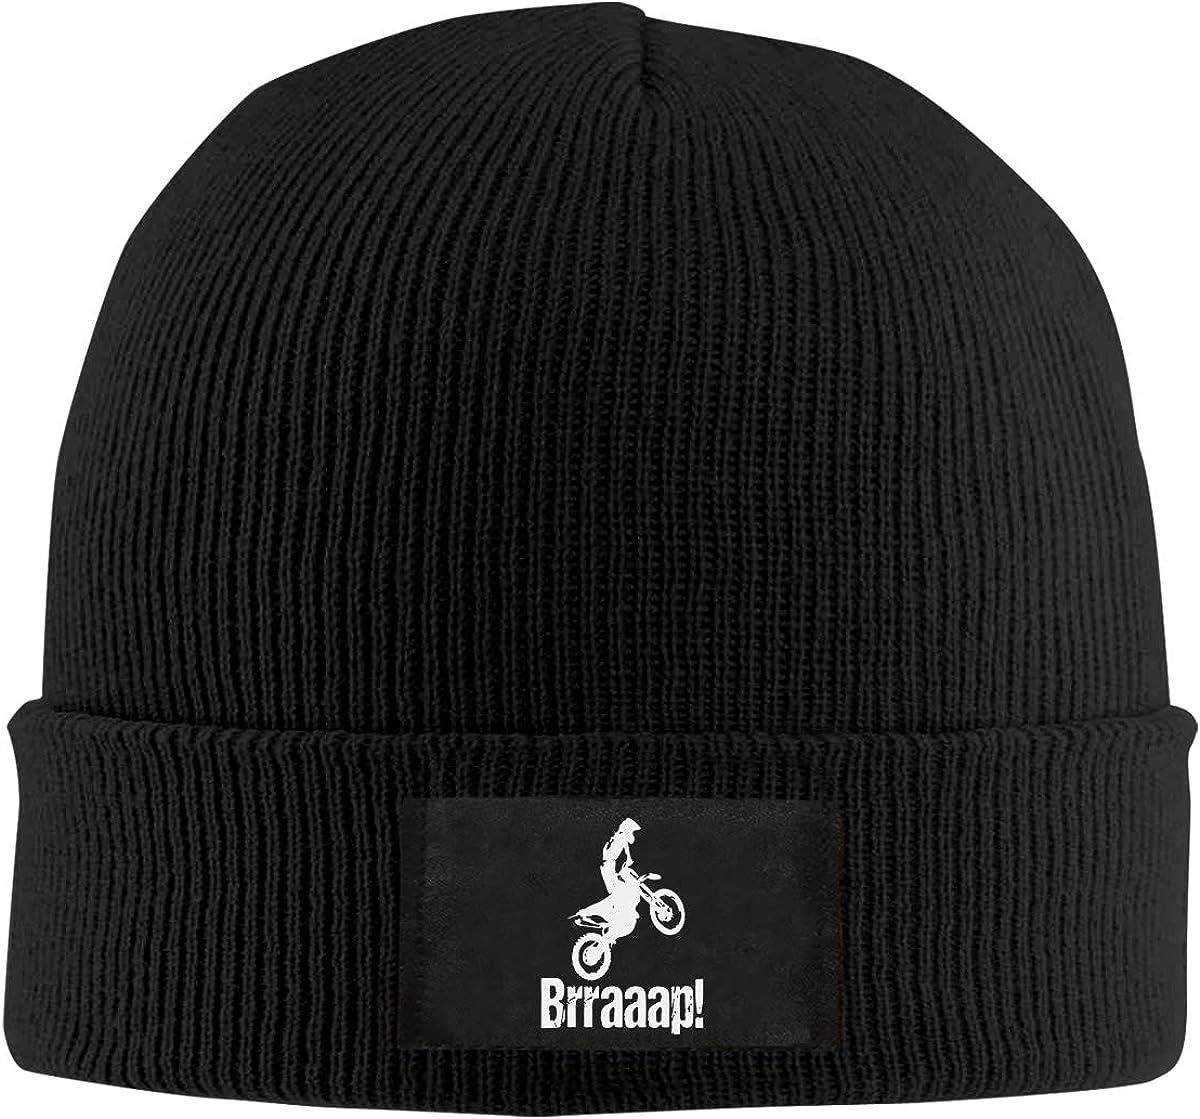 Brraaap Dirt Bike Motocross Women and Men Knitted Hat Stretchy Snowboarding Hat